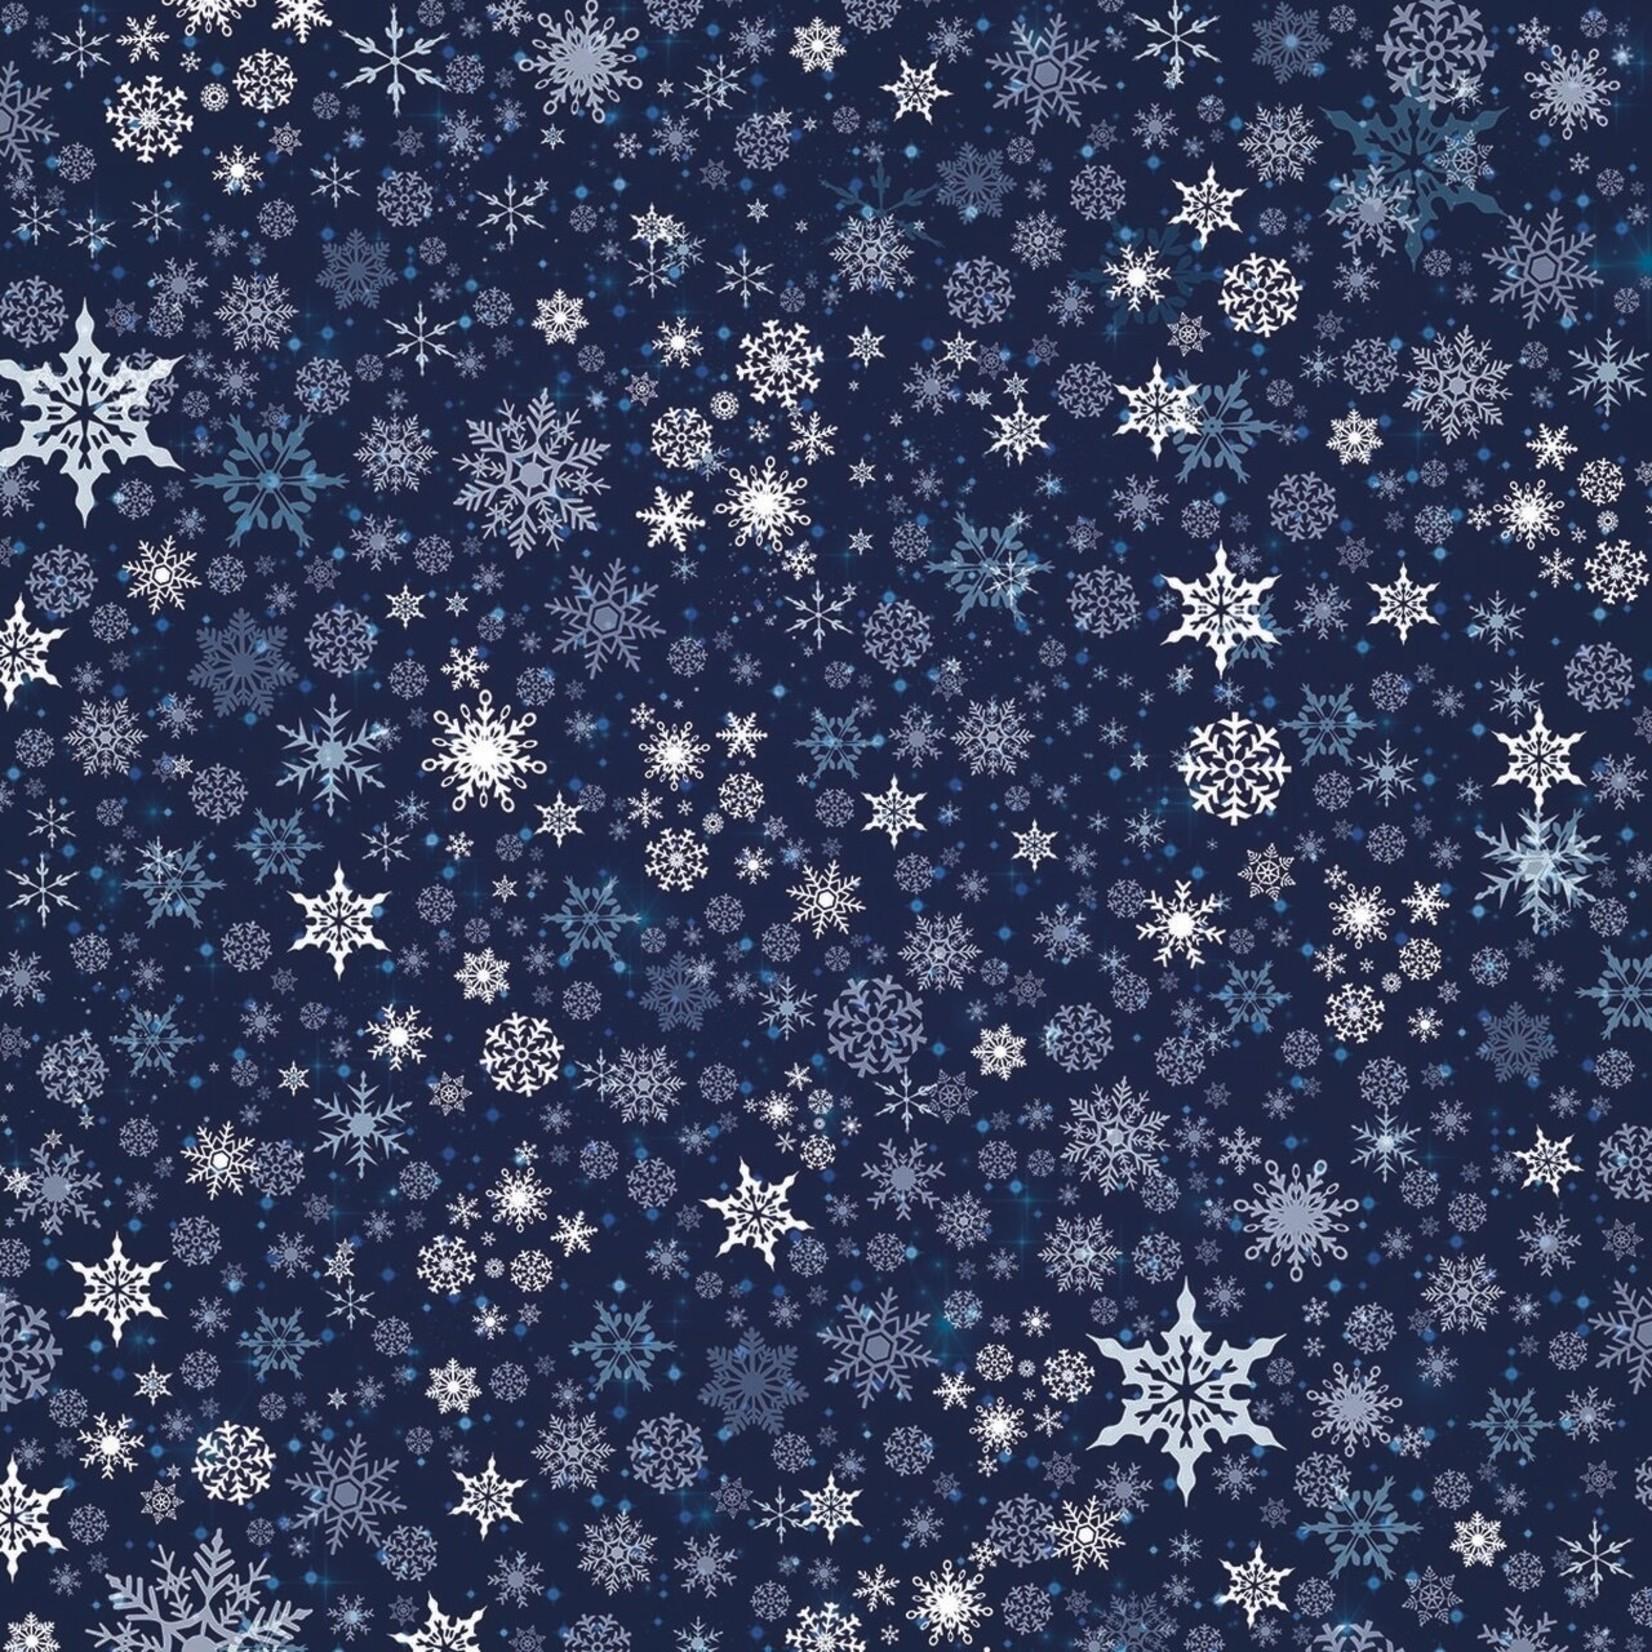 TVD Snowflakes